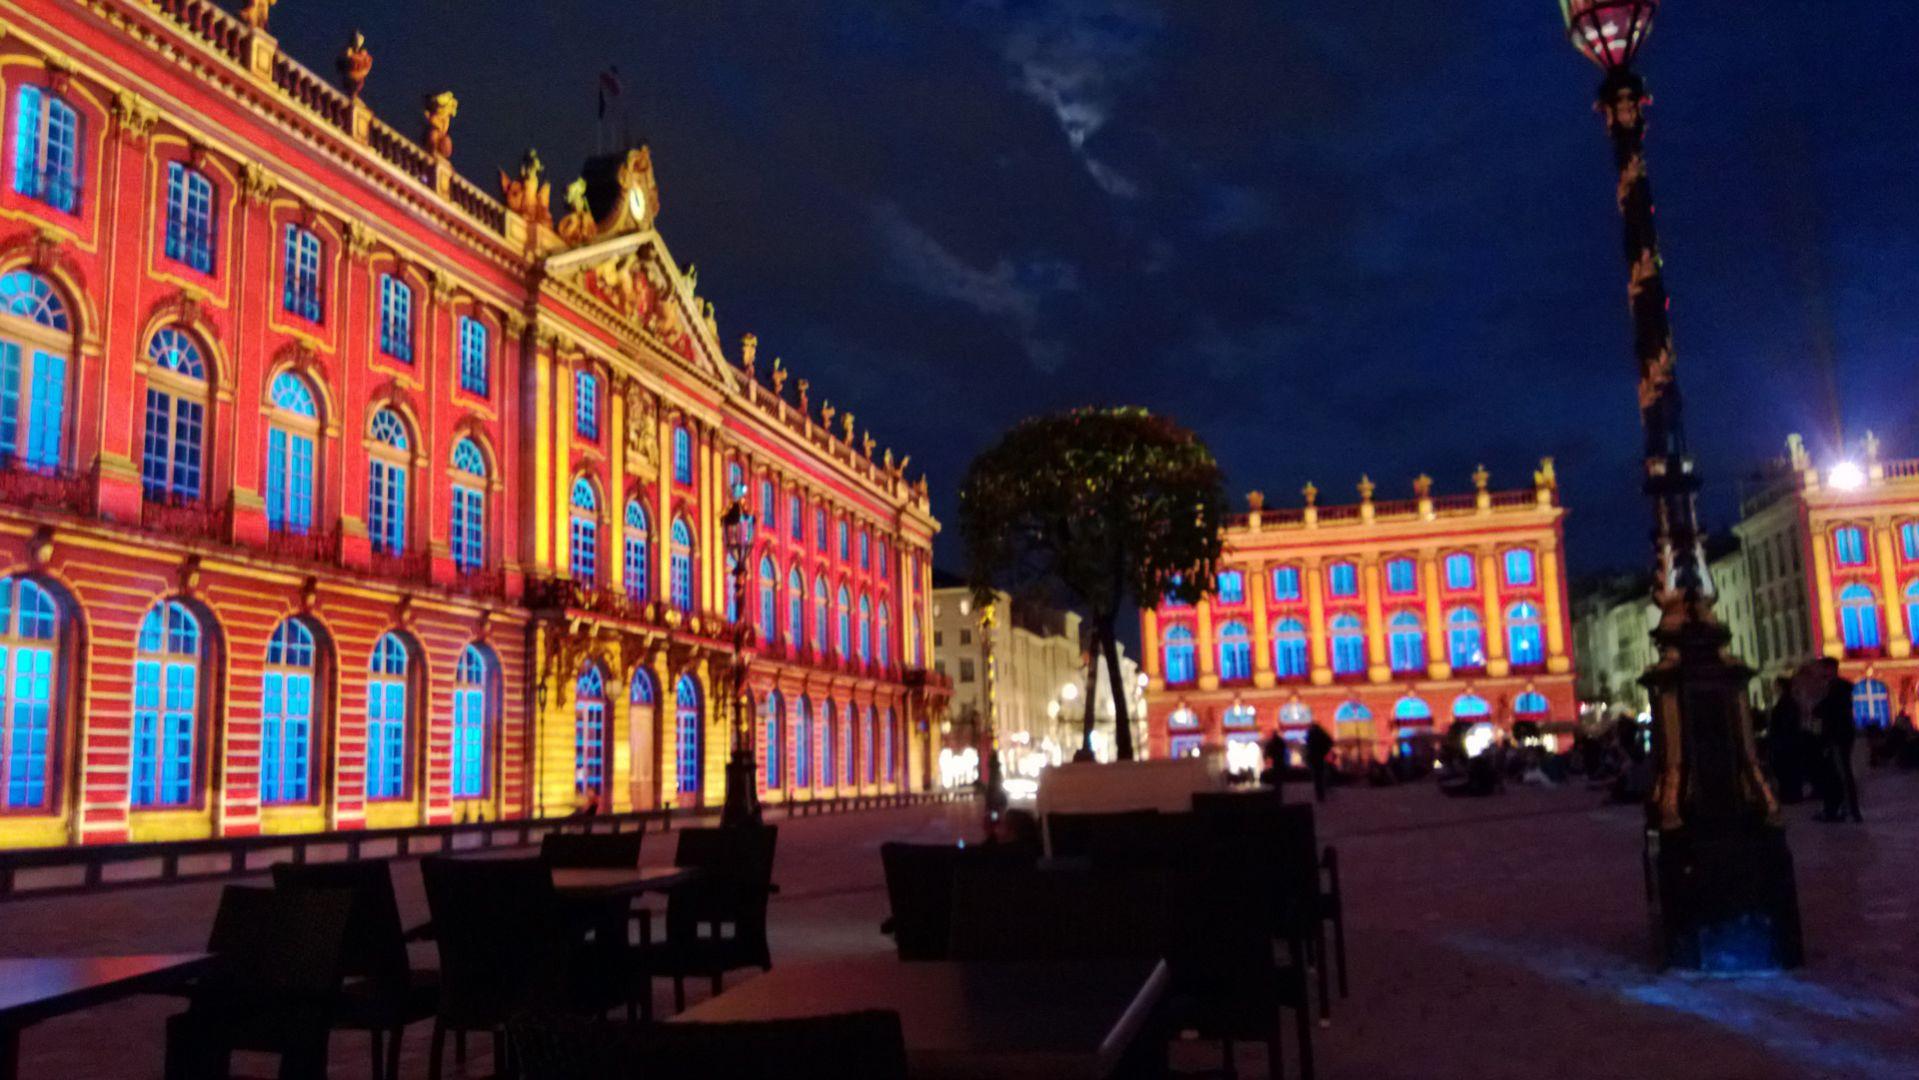 Place Stanislas de nuit - Lumia 920 - 3